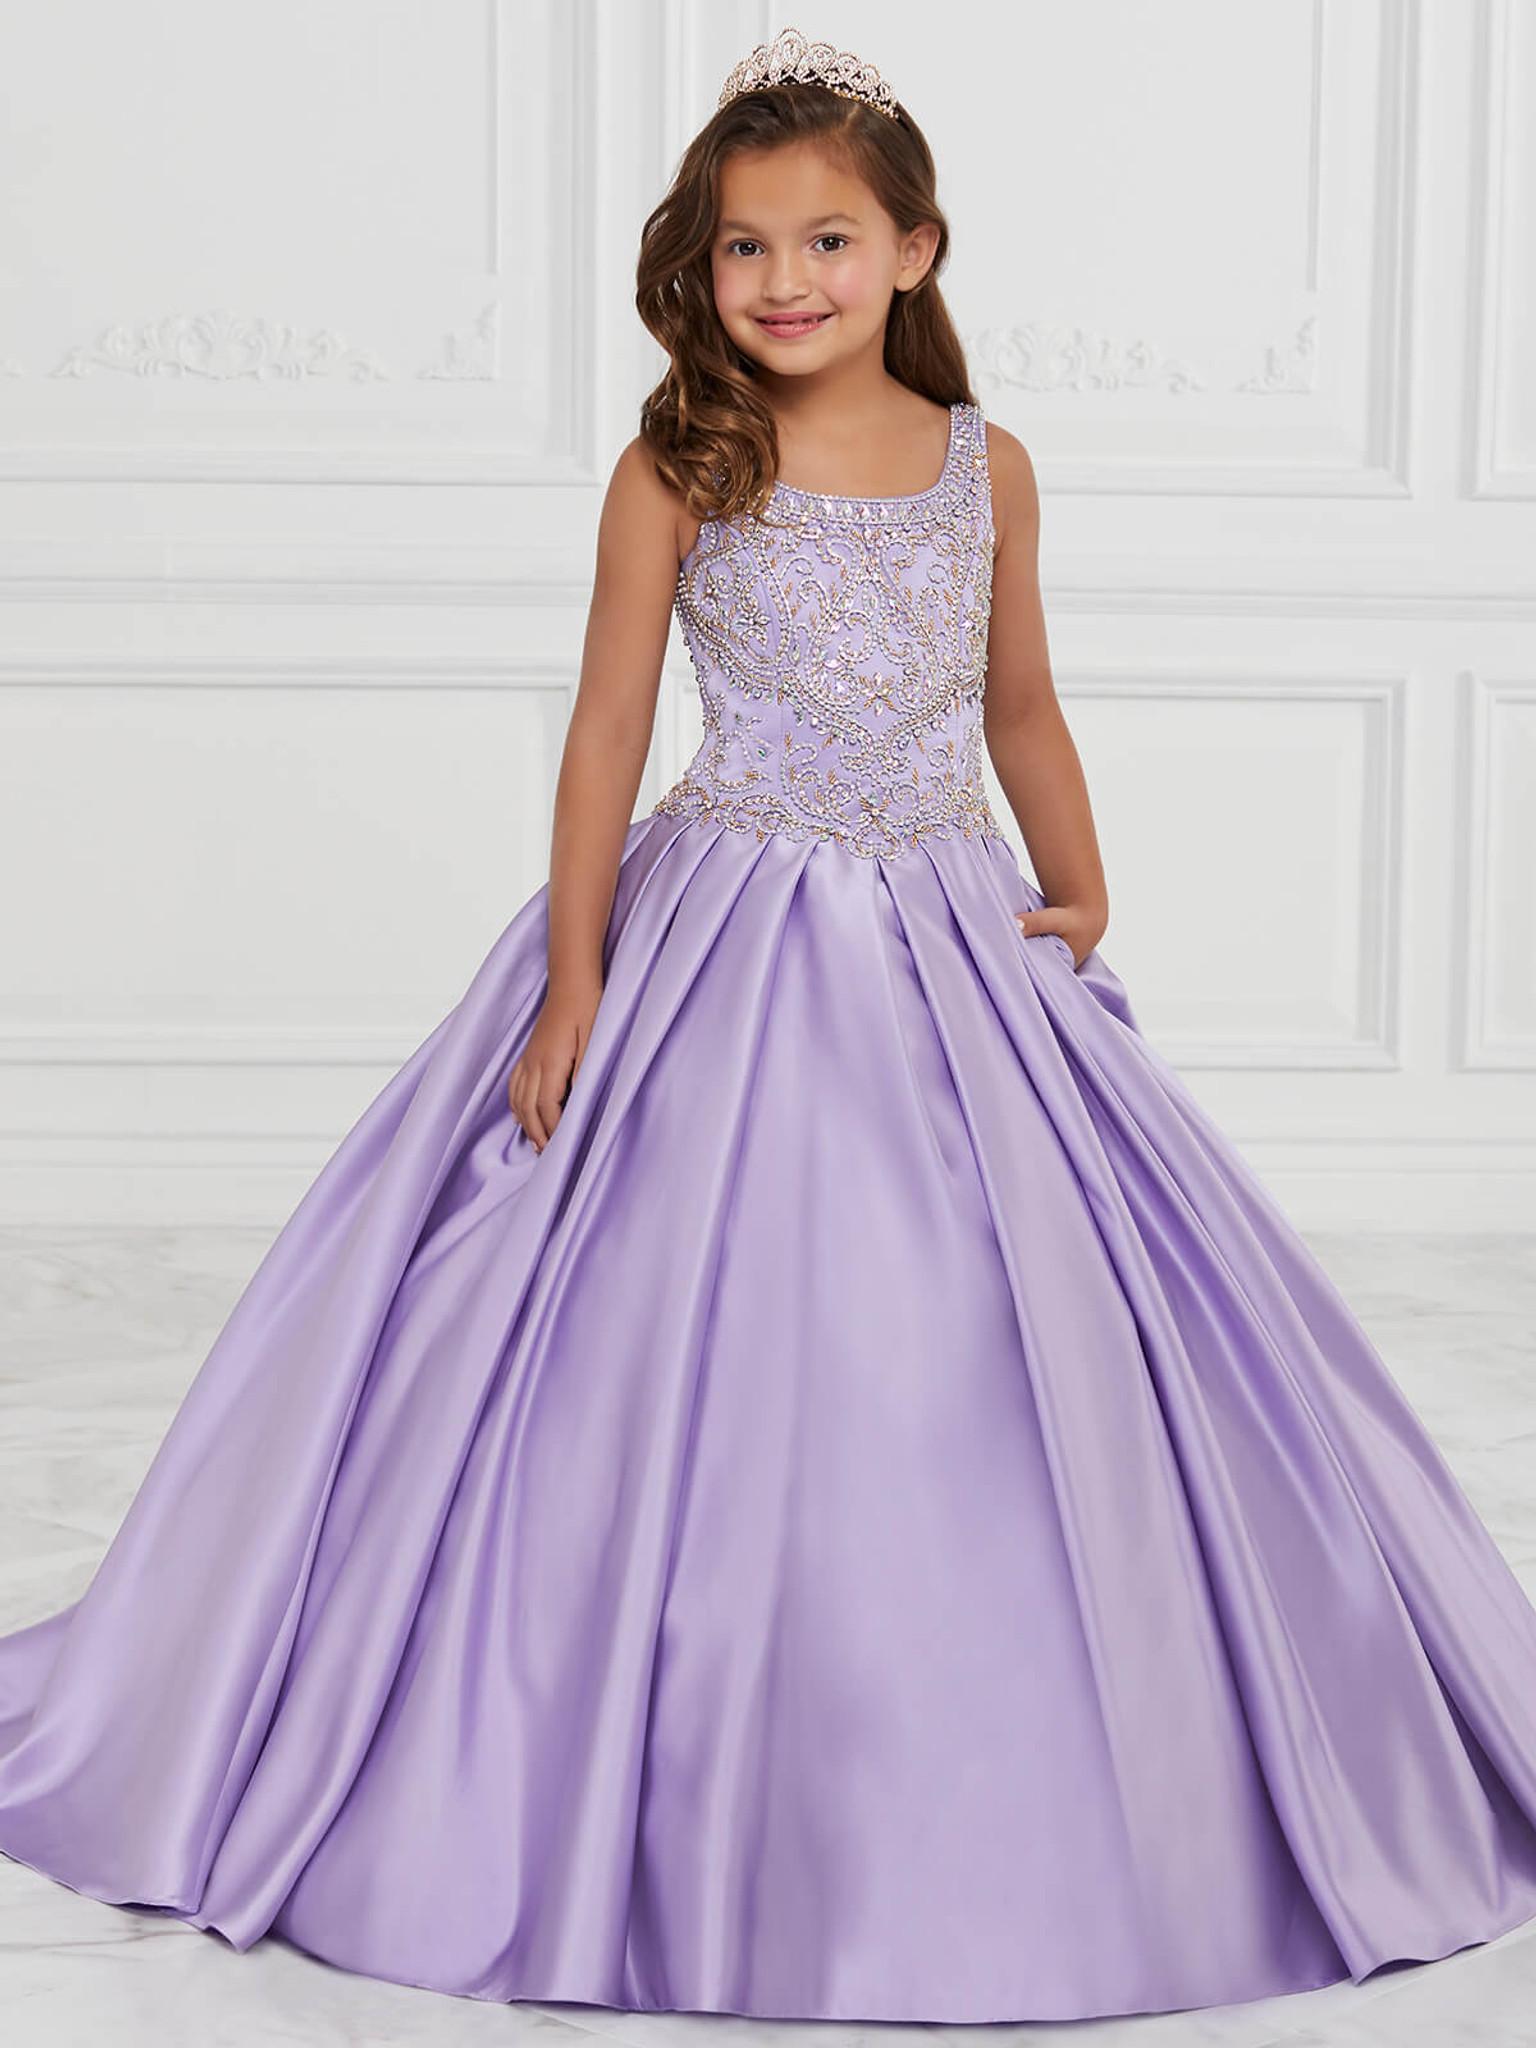 Satin Tiffany Princess 13591 Pageant Dress PageantDesigns